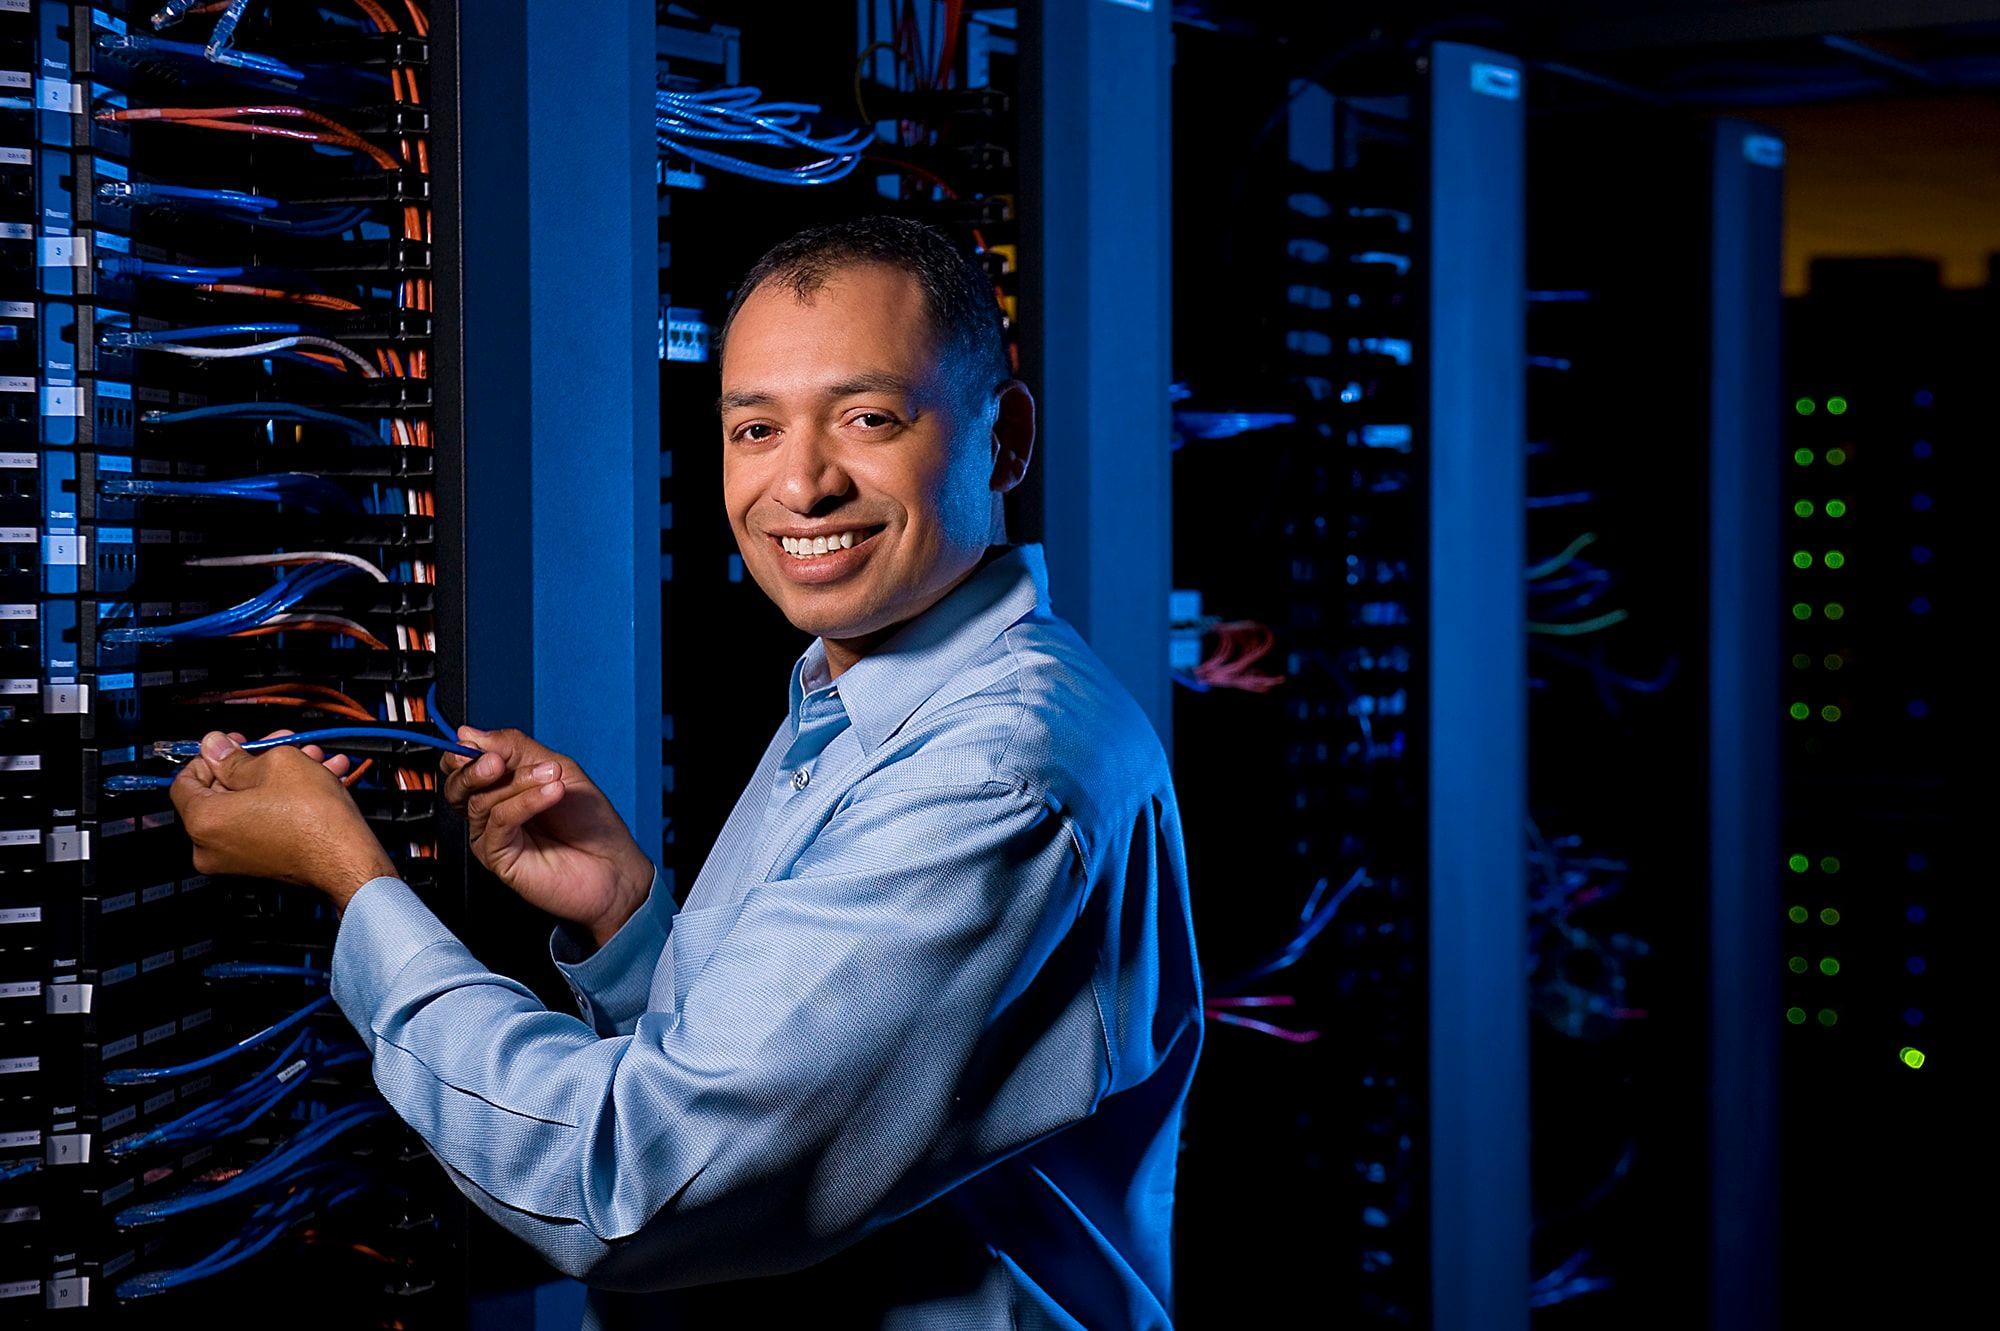 smiling employee working in cherokee data center